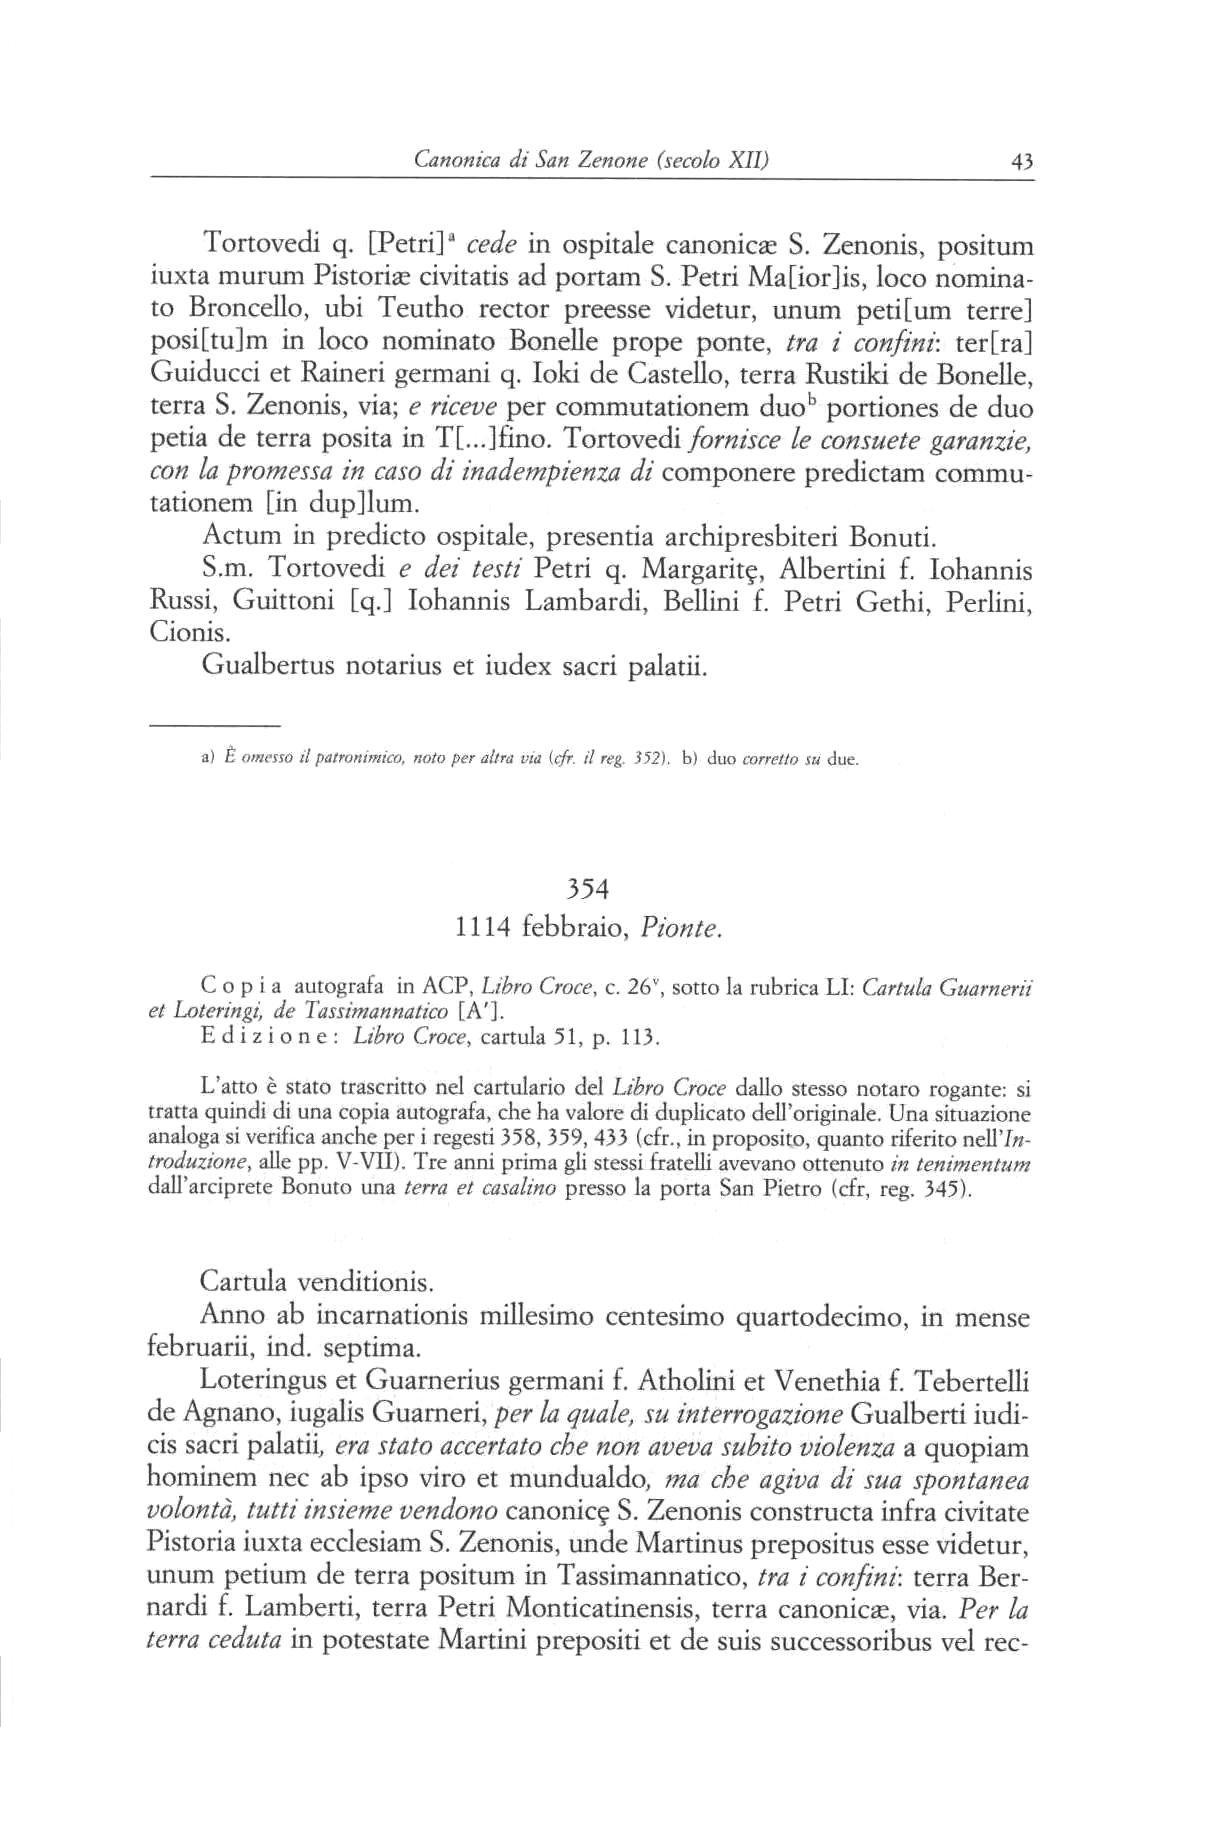 Canonica S. Zenone XII 0043.jpg